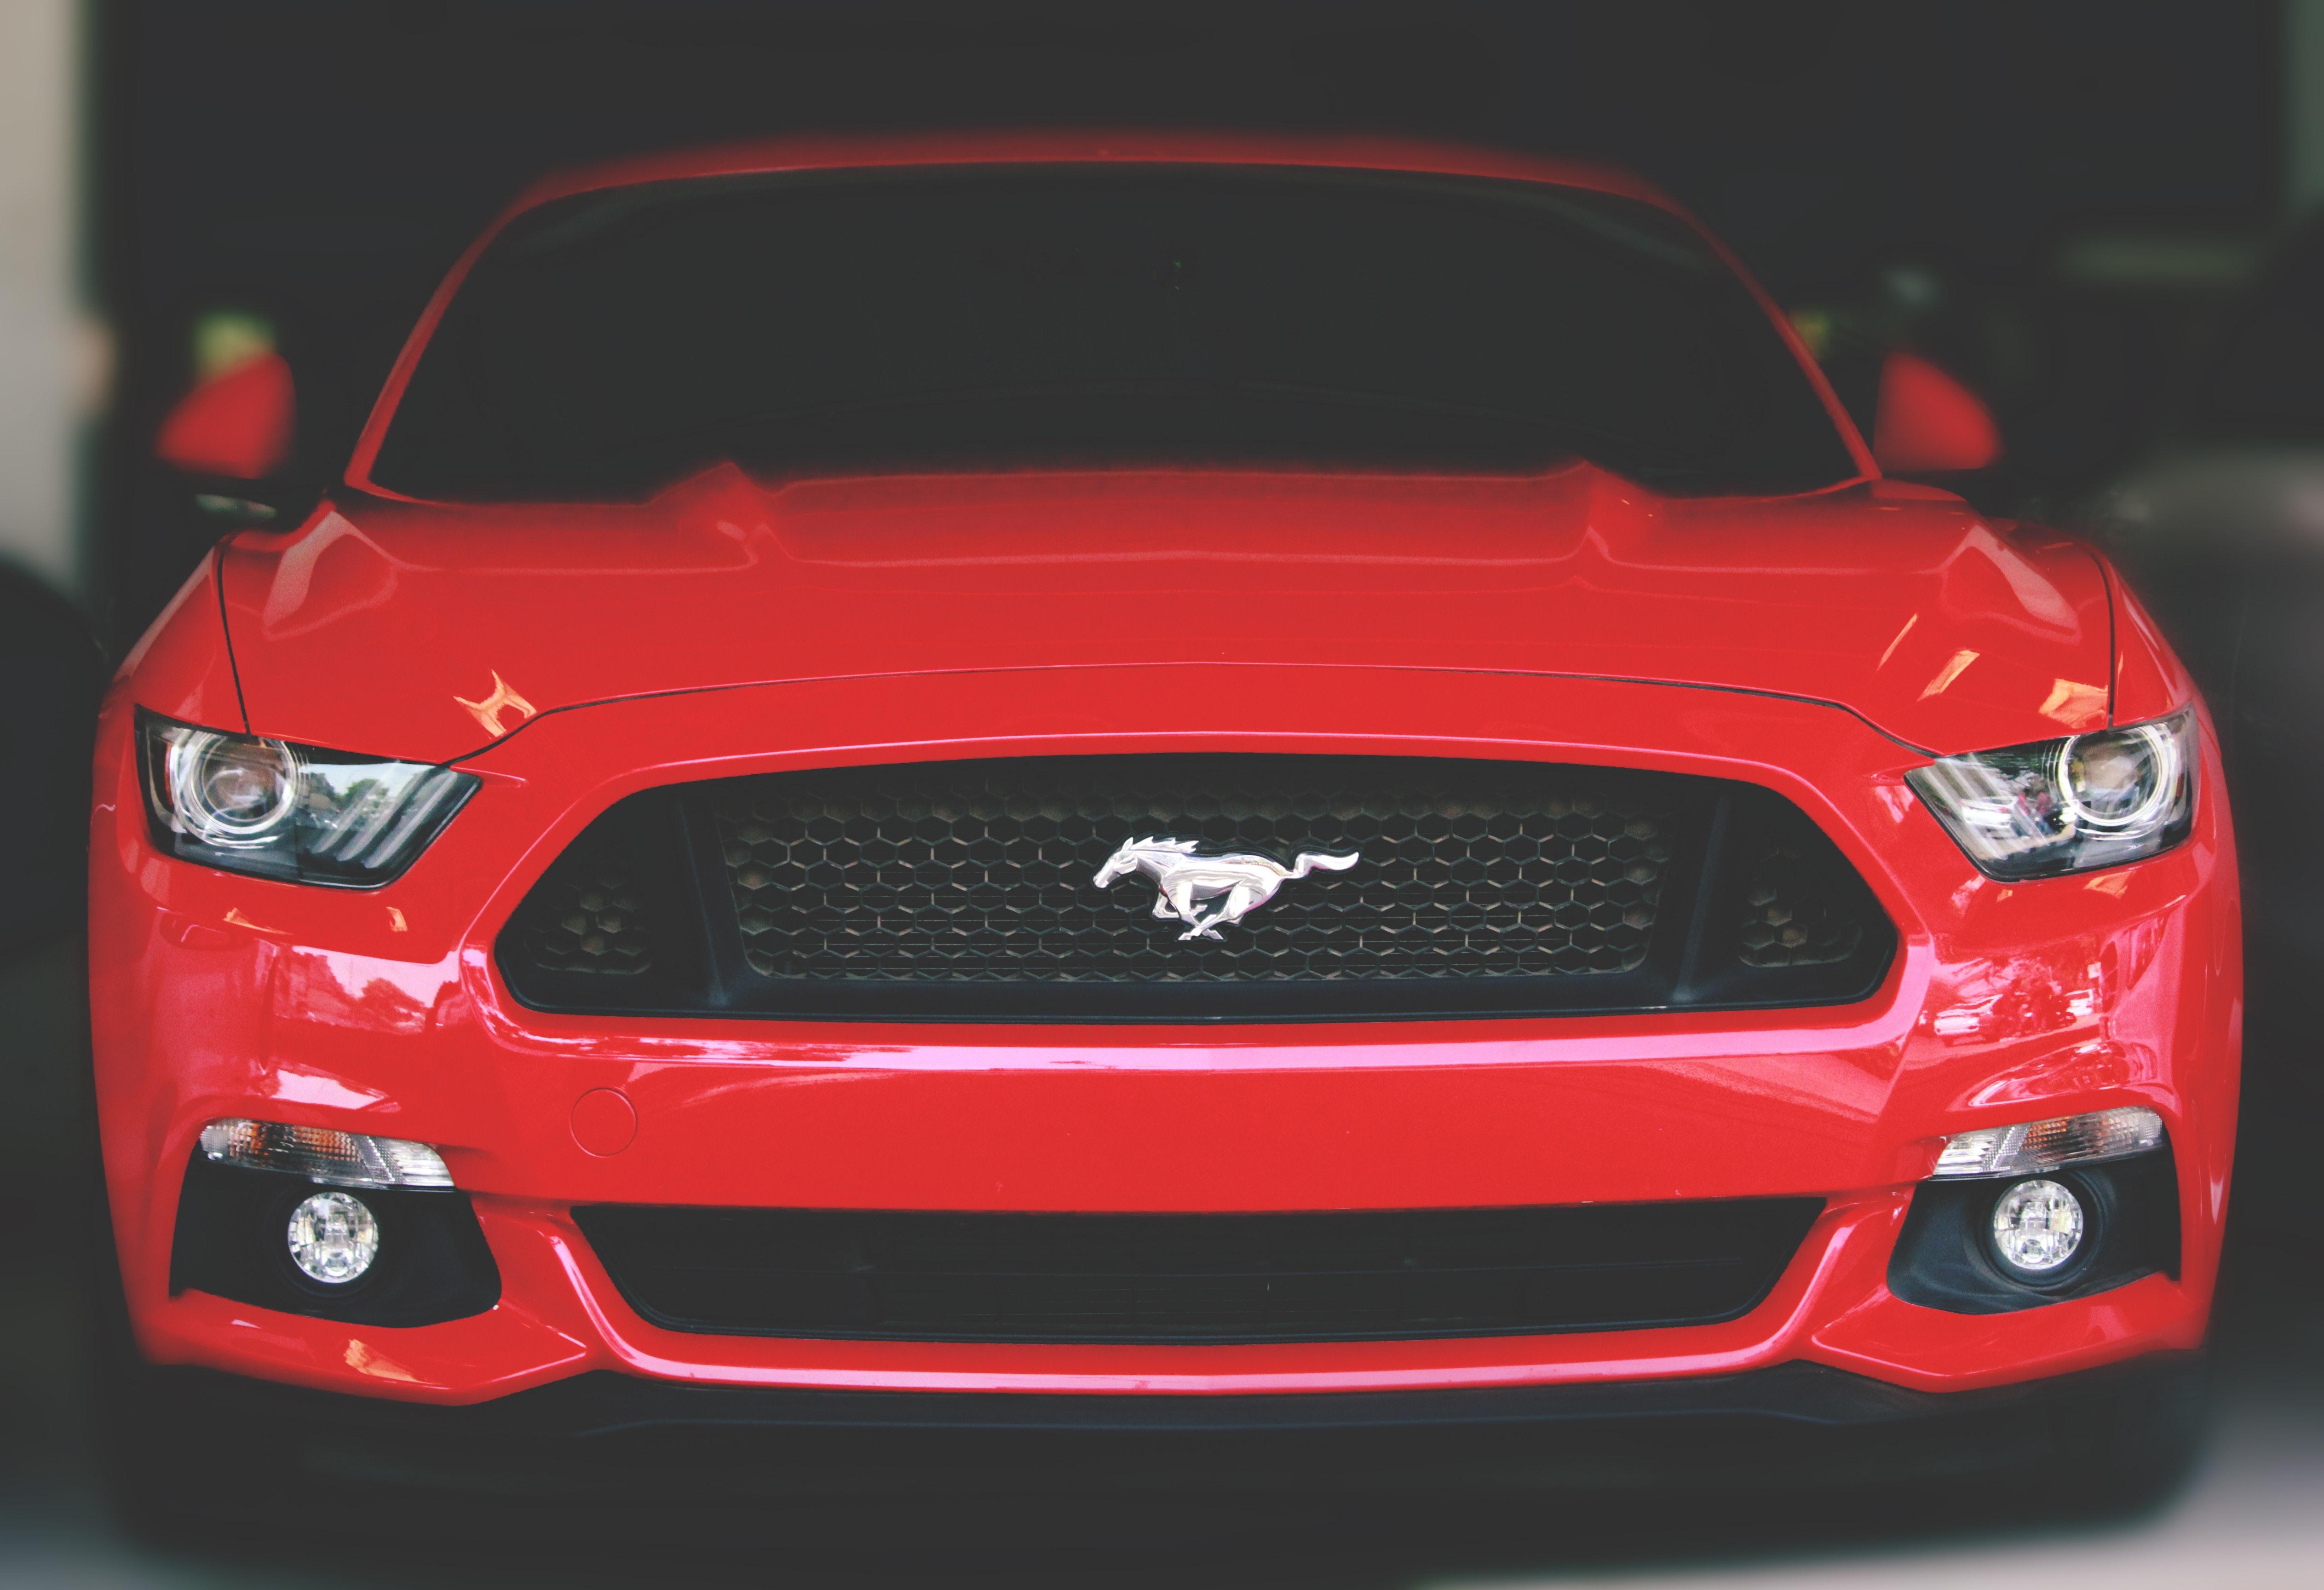 The Original Cash For Cars image 3